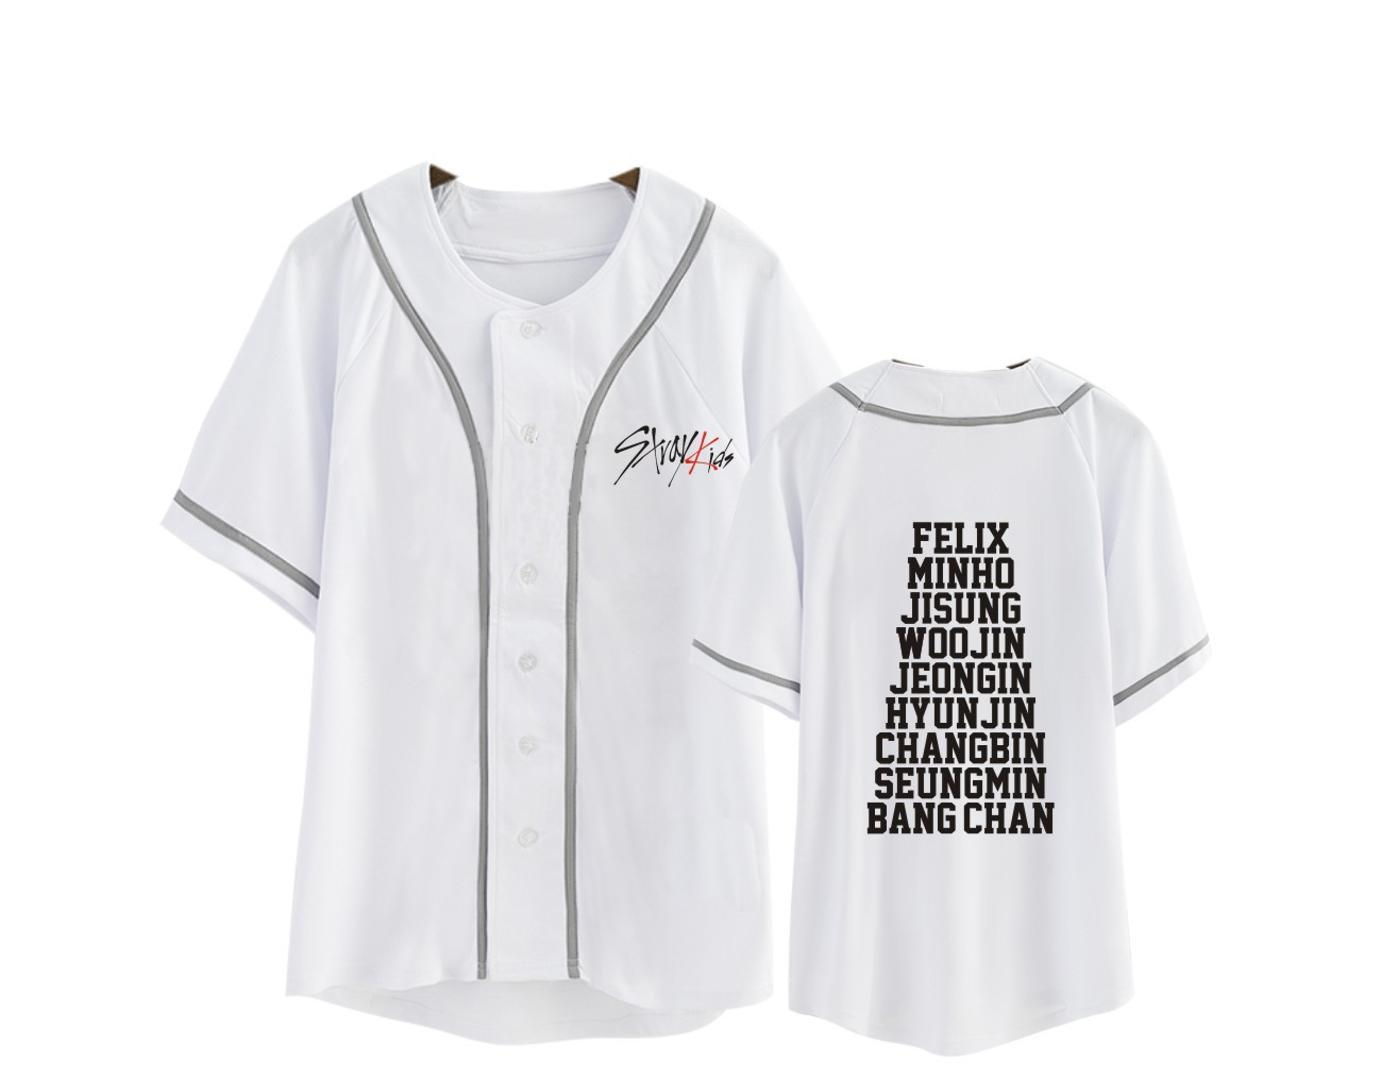 a345b48c443c8 Kpop Stray Kids Moleton Tshirt Women Men Cotton White Baseball T Shirt  Harajuku Top Short Sleeve T Shirt Best Tee Shirt Sites Online Funky T  Shirts From ...